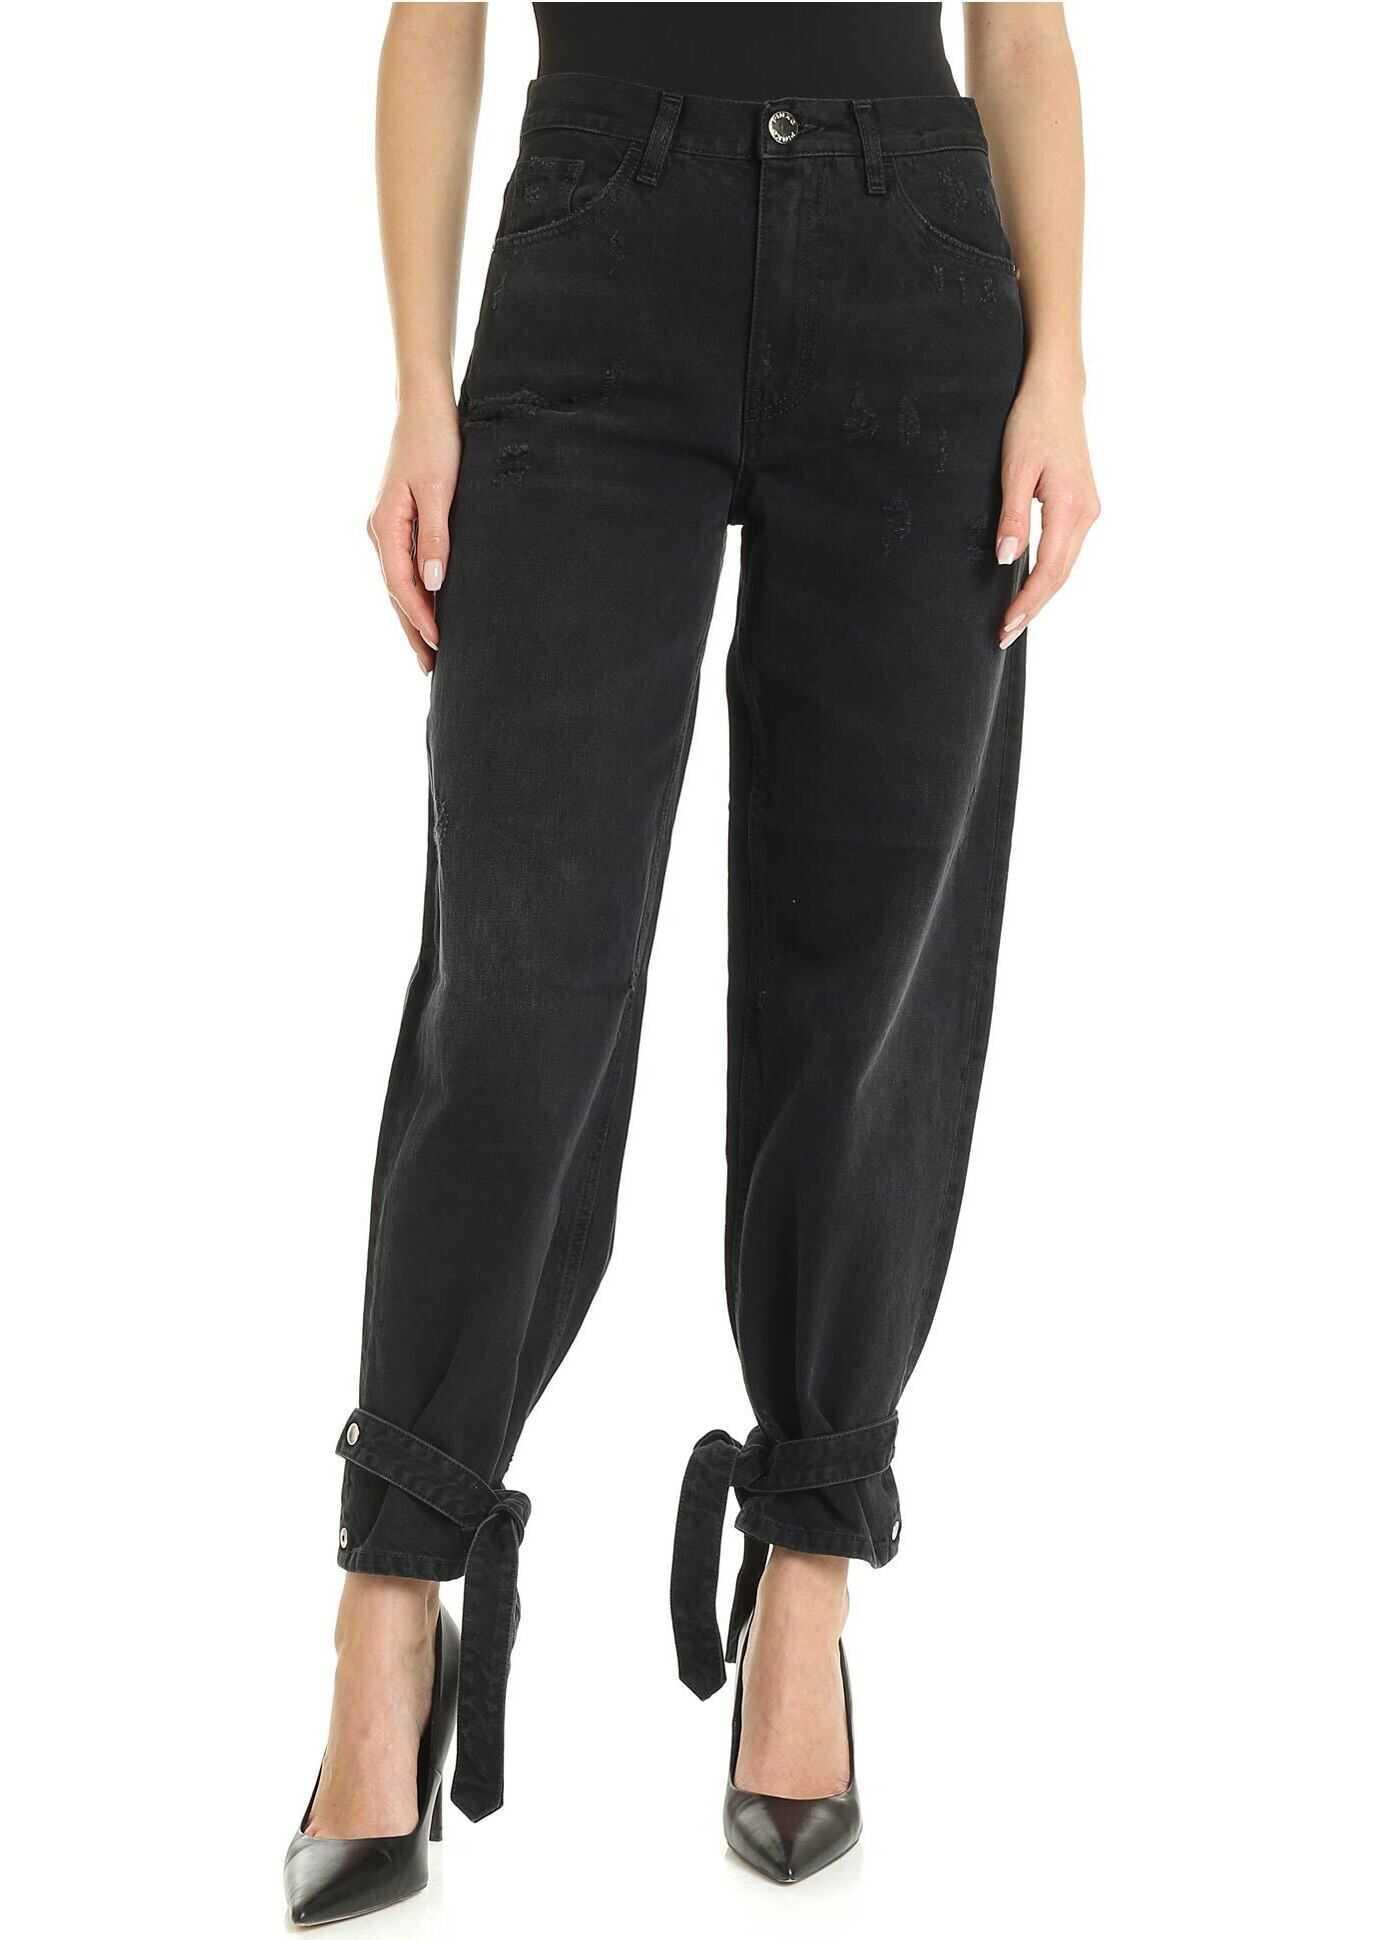 Pinko Maddie 6 Jeans In Black Black